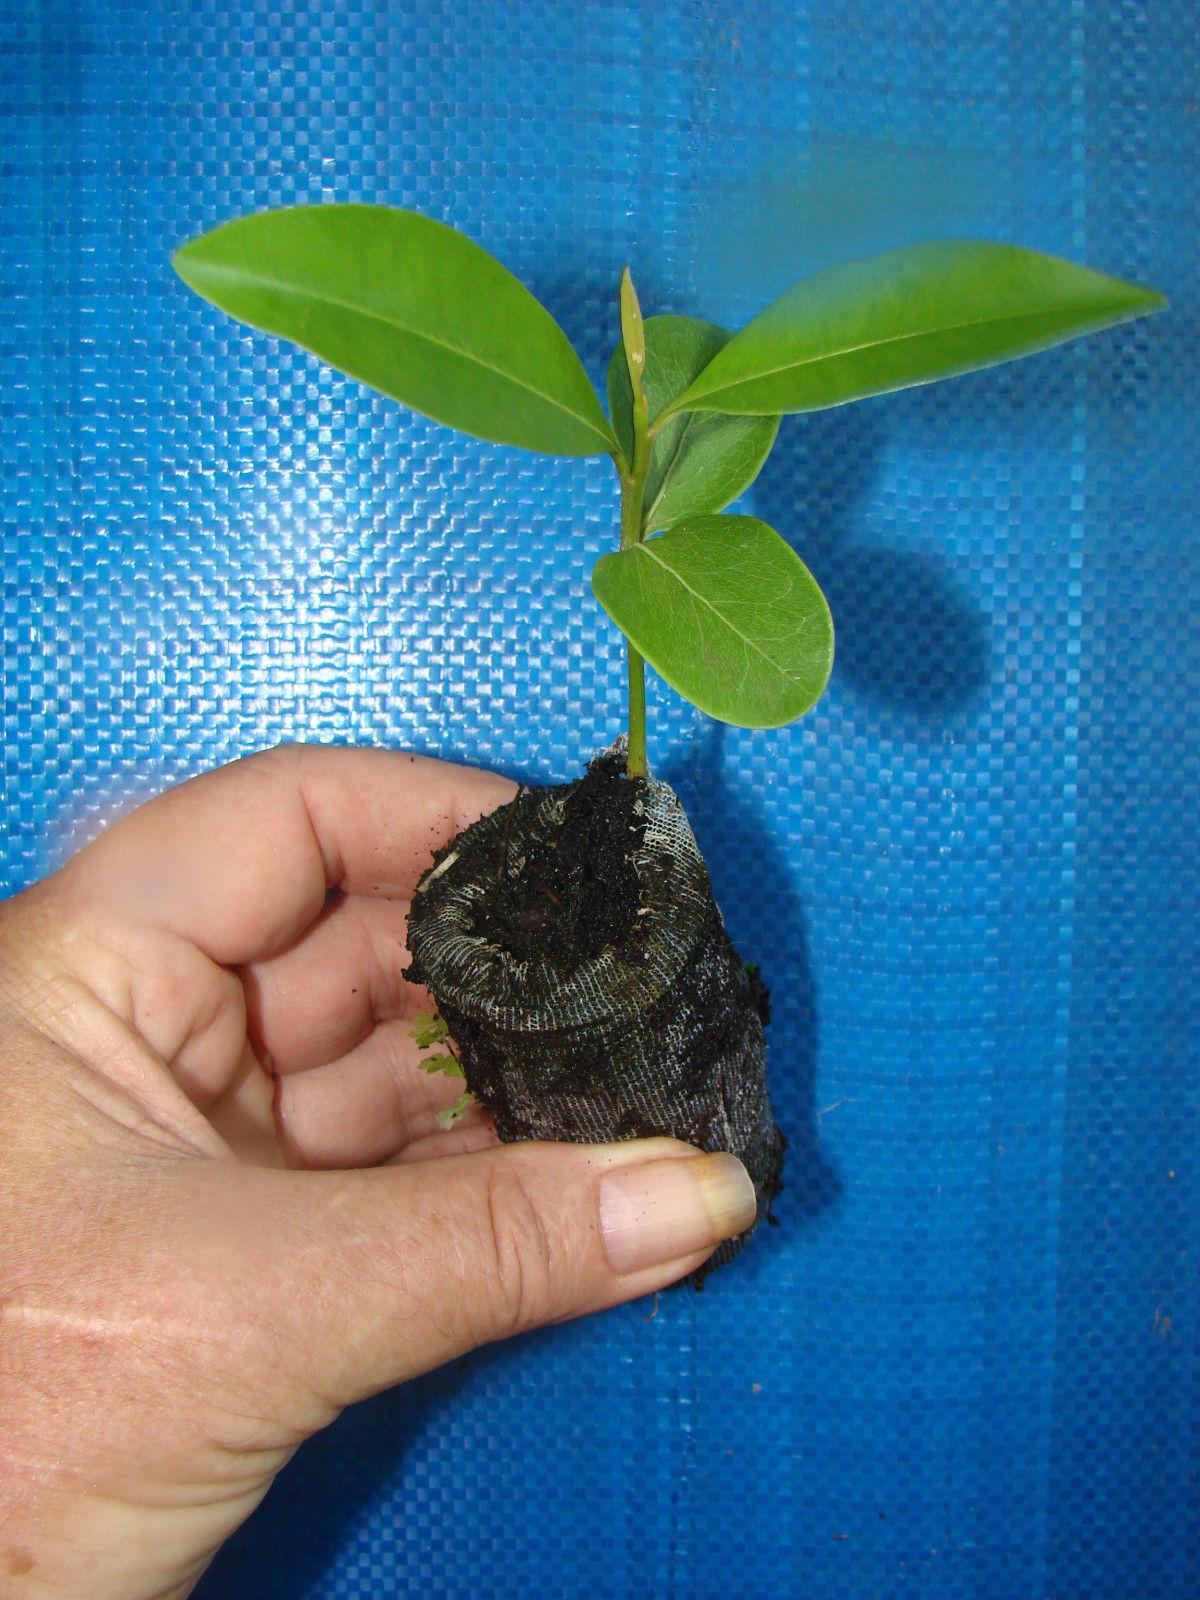 polynesian produce stand sapodilla manilkara zapota cv alano chico sapote zapote nispero live seedling